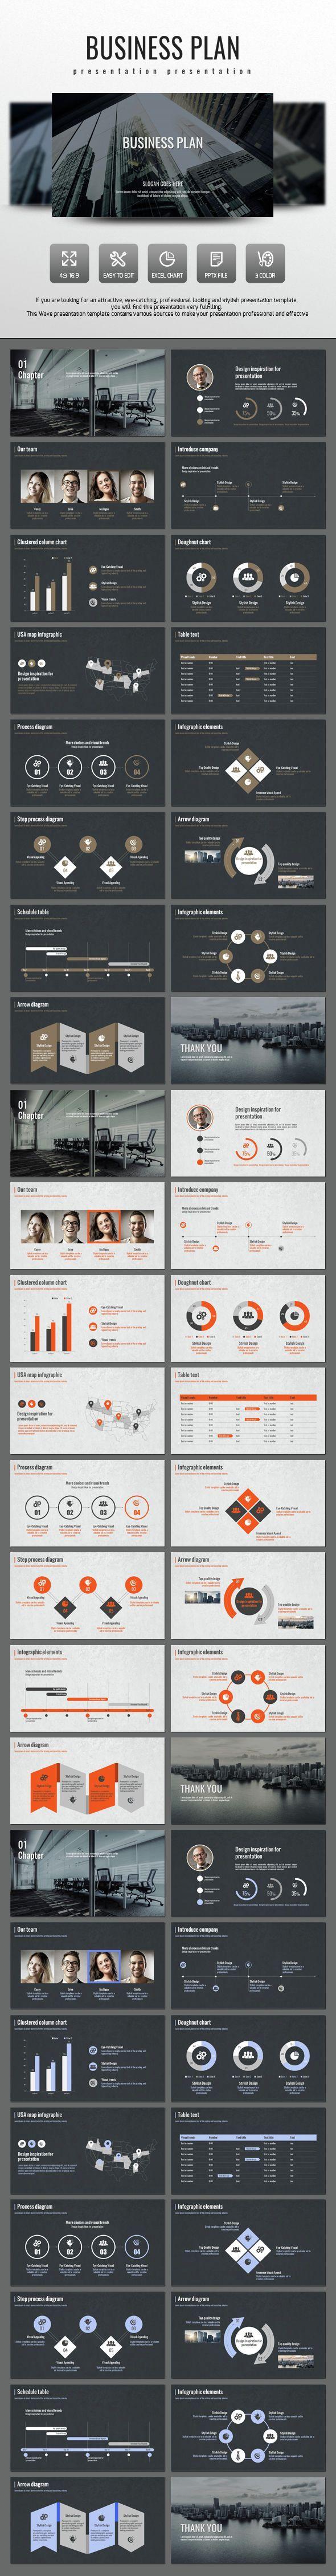 Business Plan (PowerPoint Templates) | Uni | Pinterest | Business ...